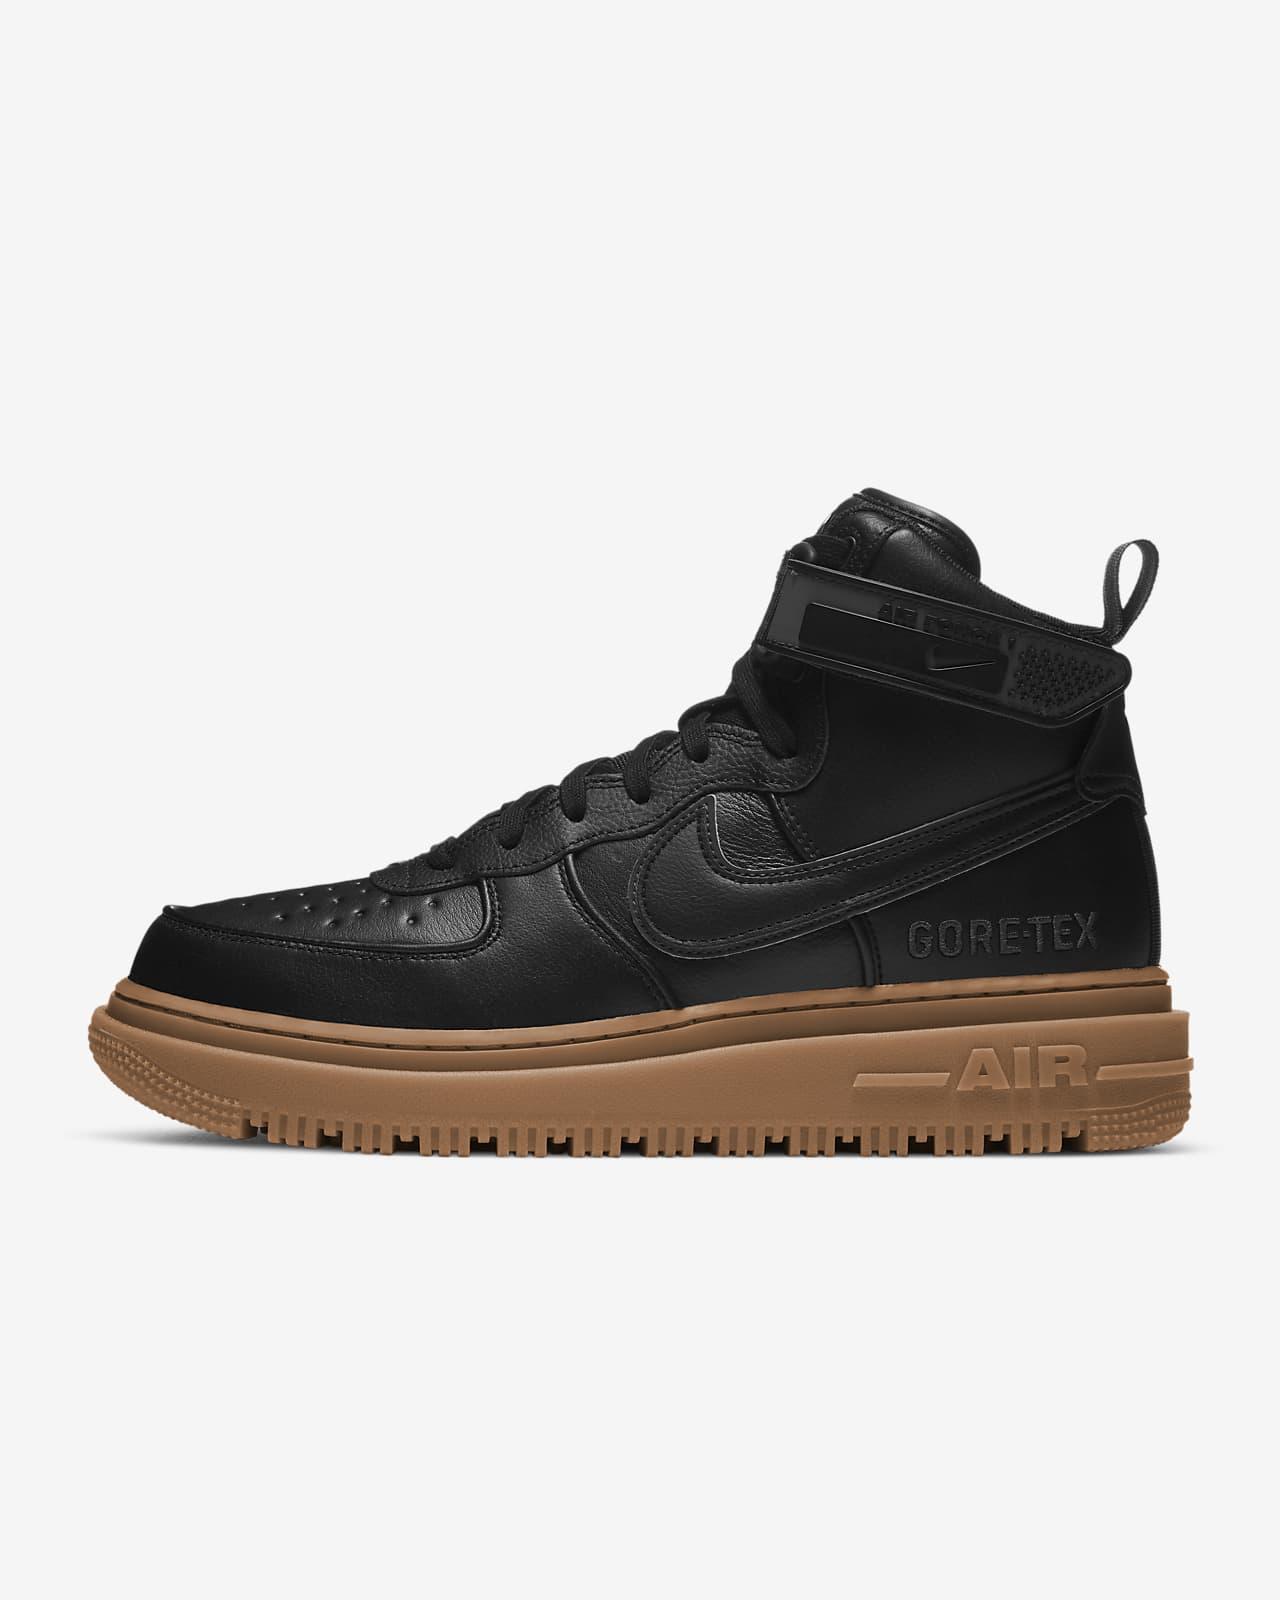 Scarponcino Nike Air Force 1 GTX Boot